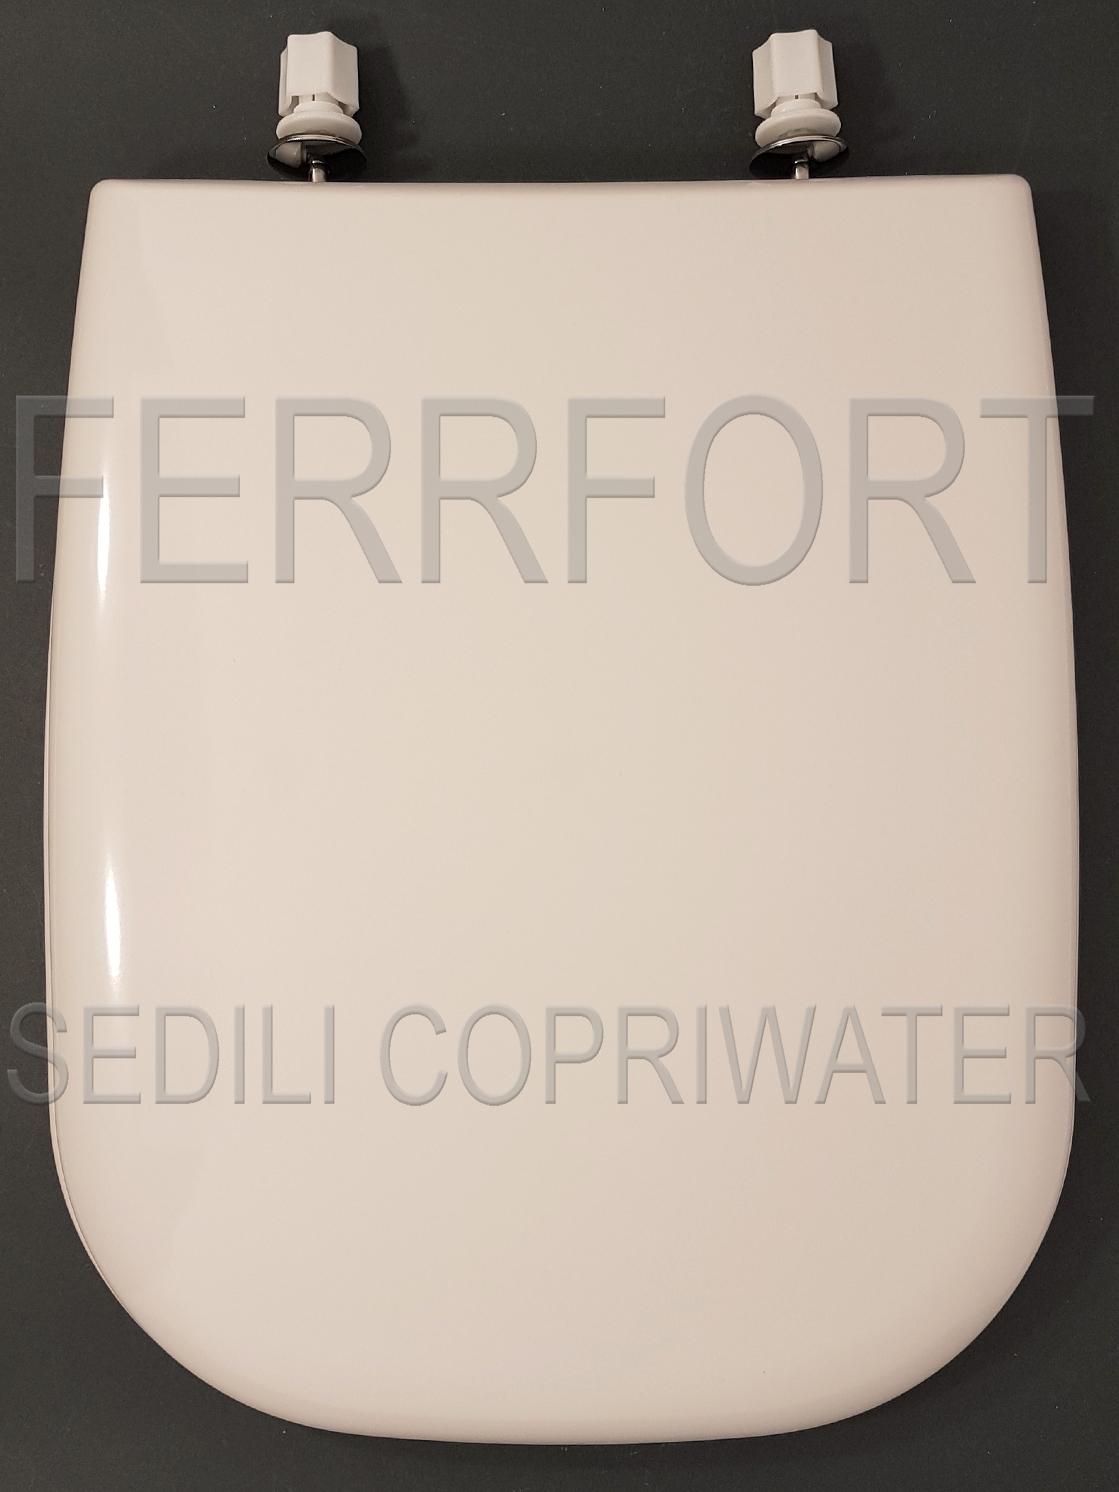 SEDILE COPRIWATER D-CODE DURAVIT BIANCO